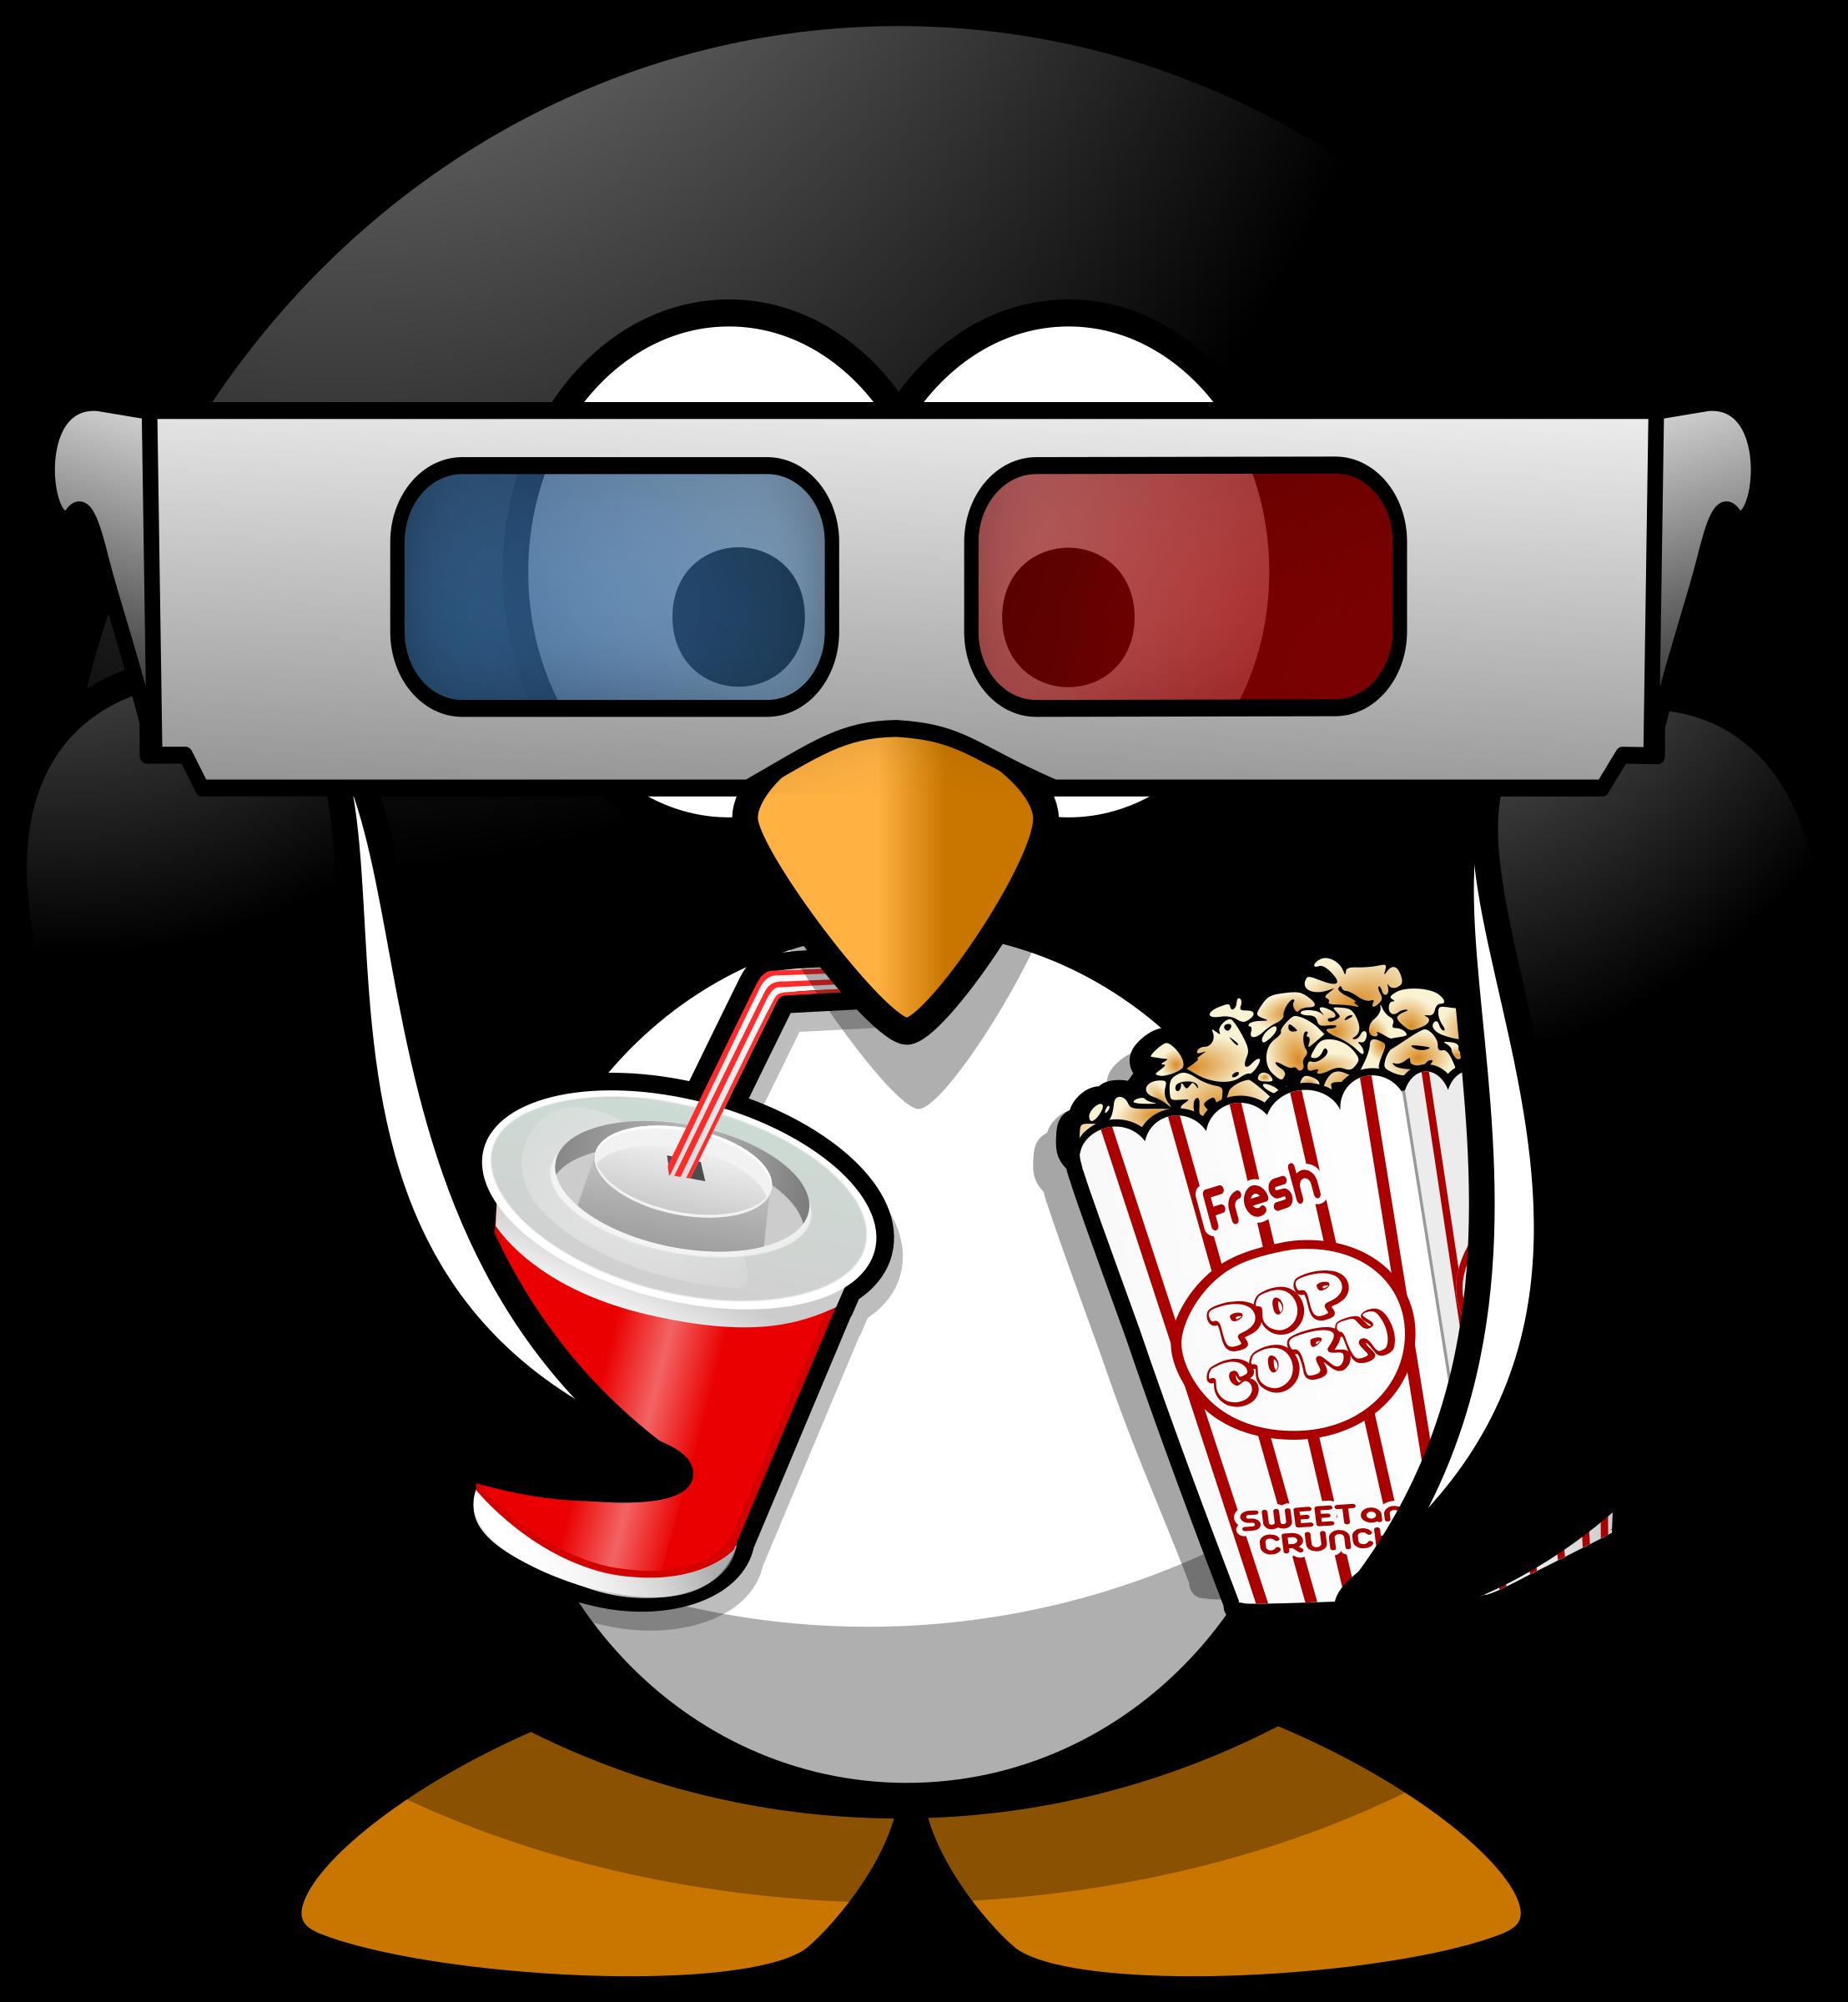 image royalty free download Penguin big image png. Cinema clipart